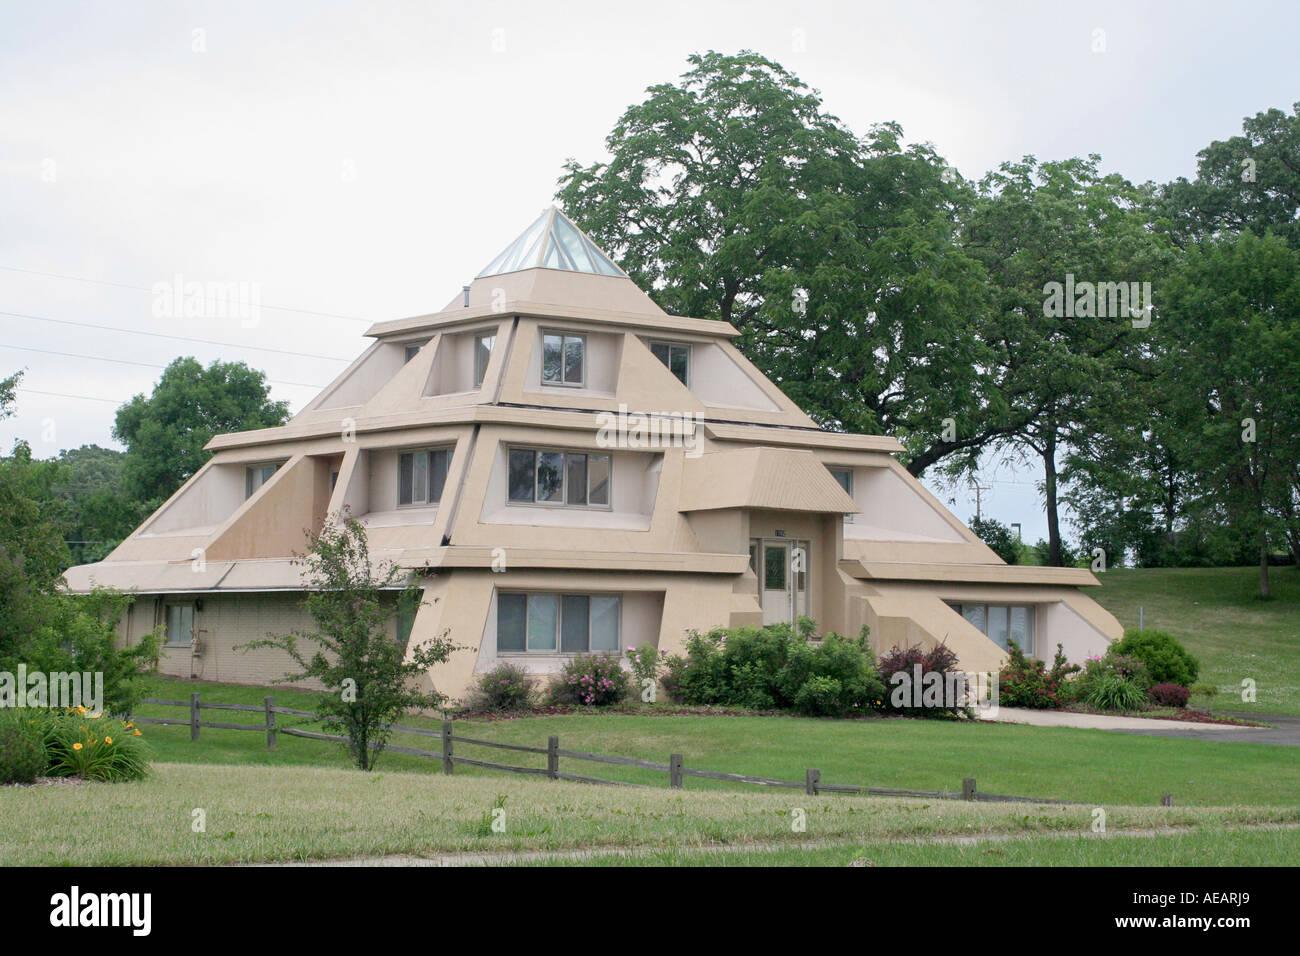 Pyramid House Clear Lake Iowa Stock Photo Royalty Free